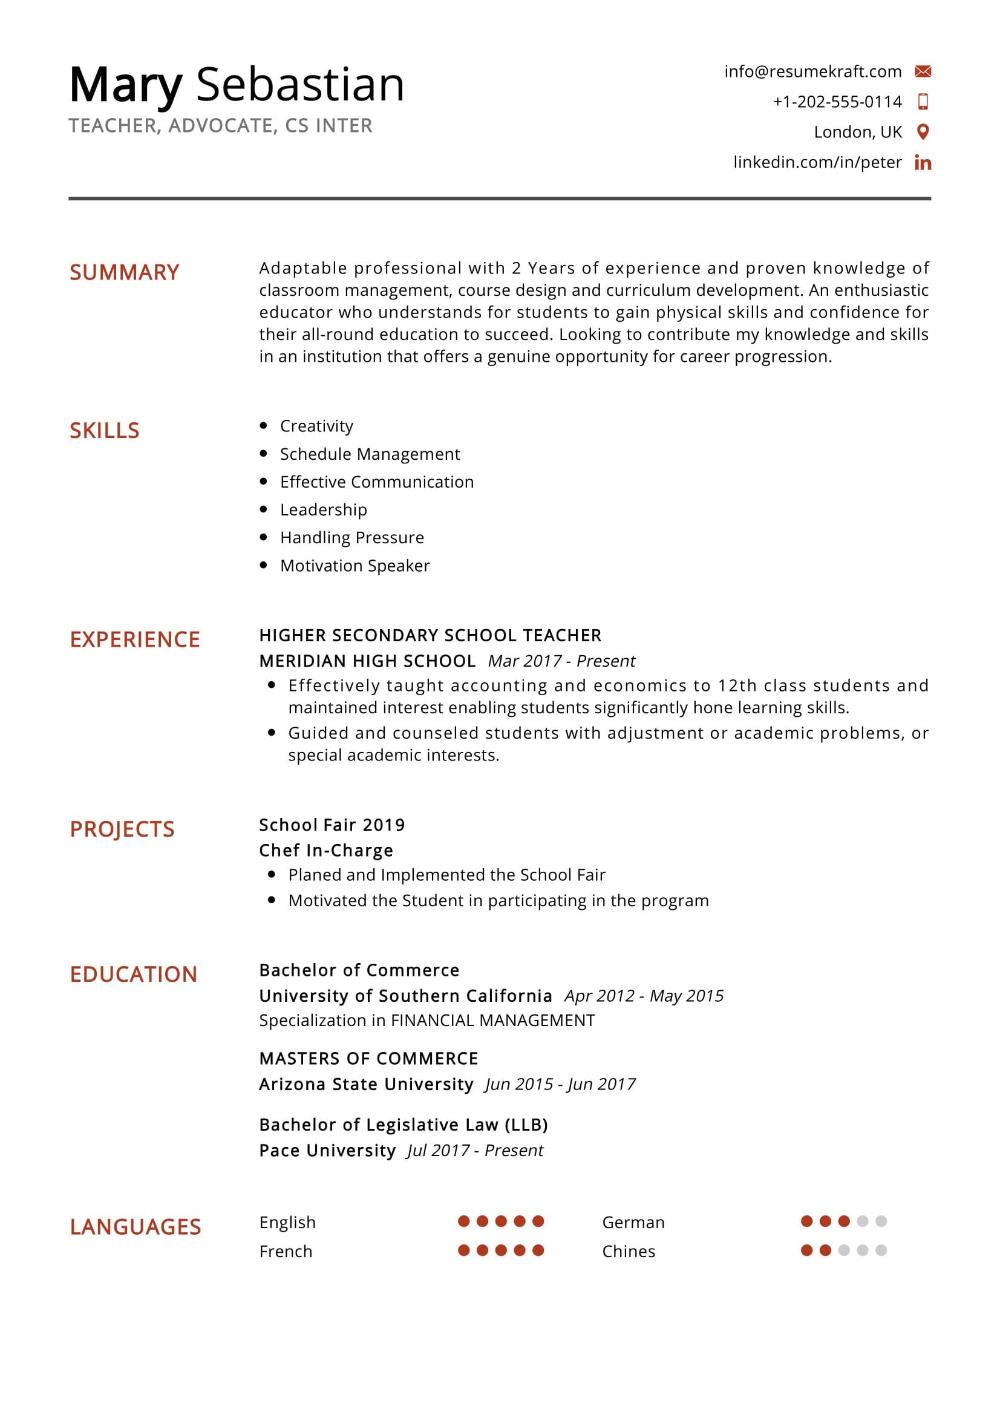 100 Professional Resume Samples For 2020 Resumekraft Teacher Resume Examples High School Resume Template High School Resume